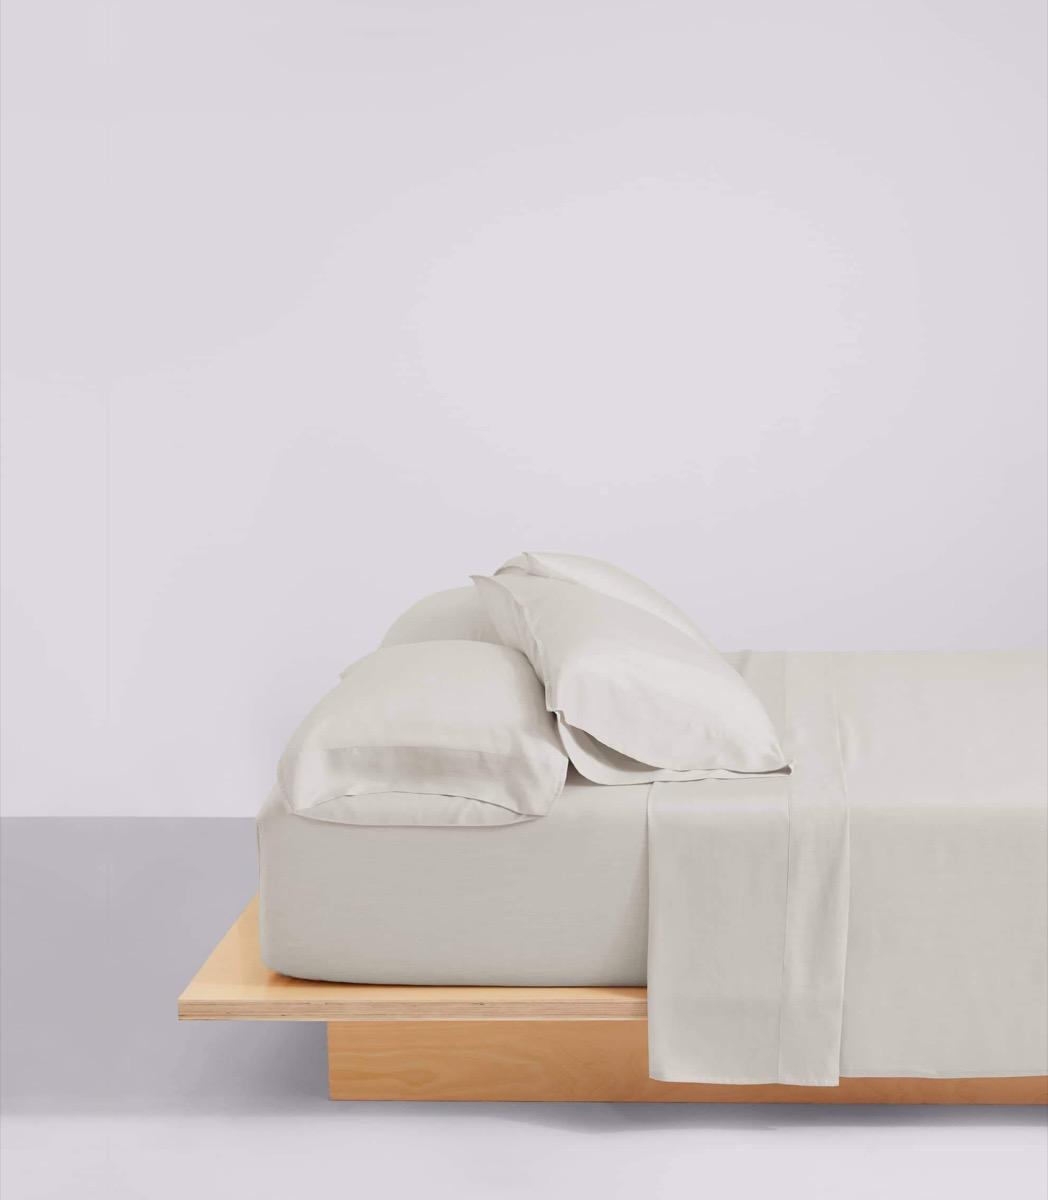 wooden platform bed with beige sheets